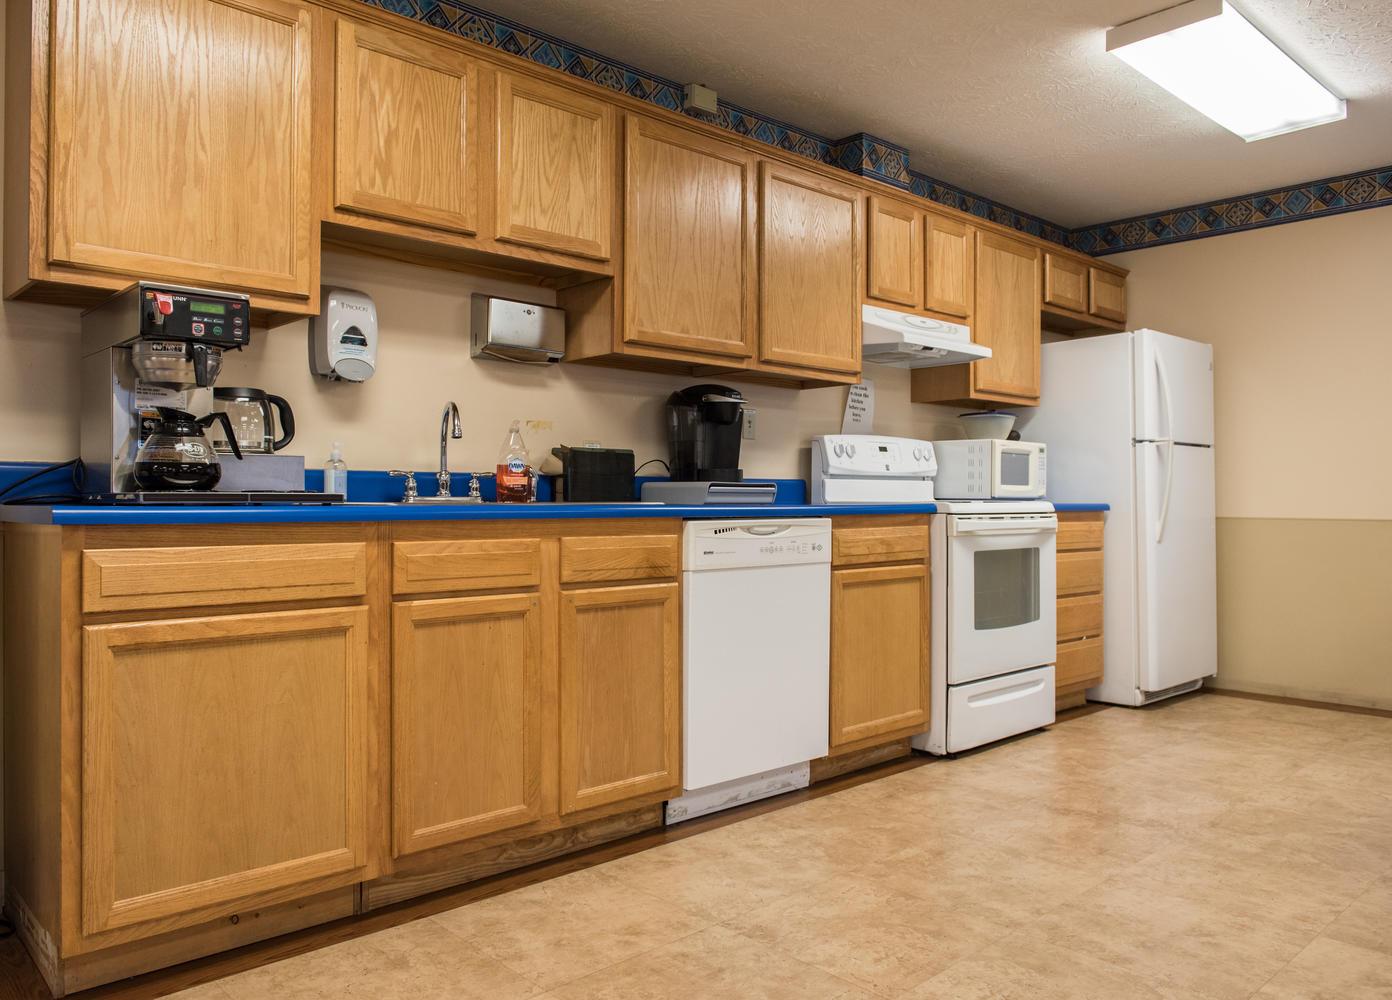 Kitchen area in Stonerise Lewisburg Rehabilitation room